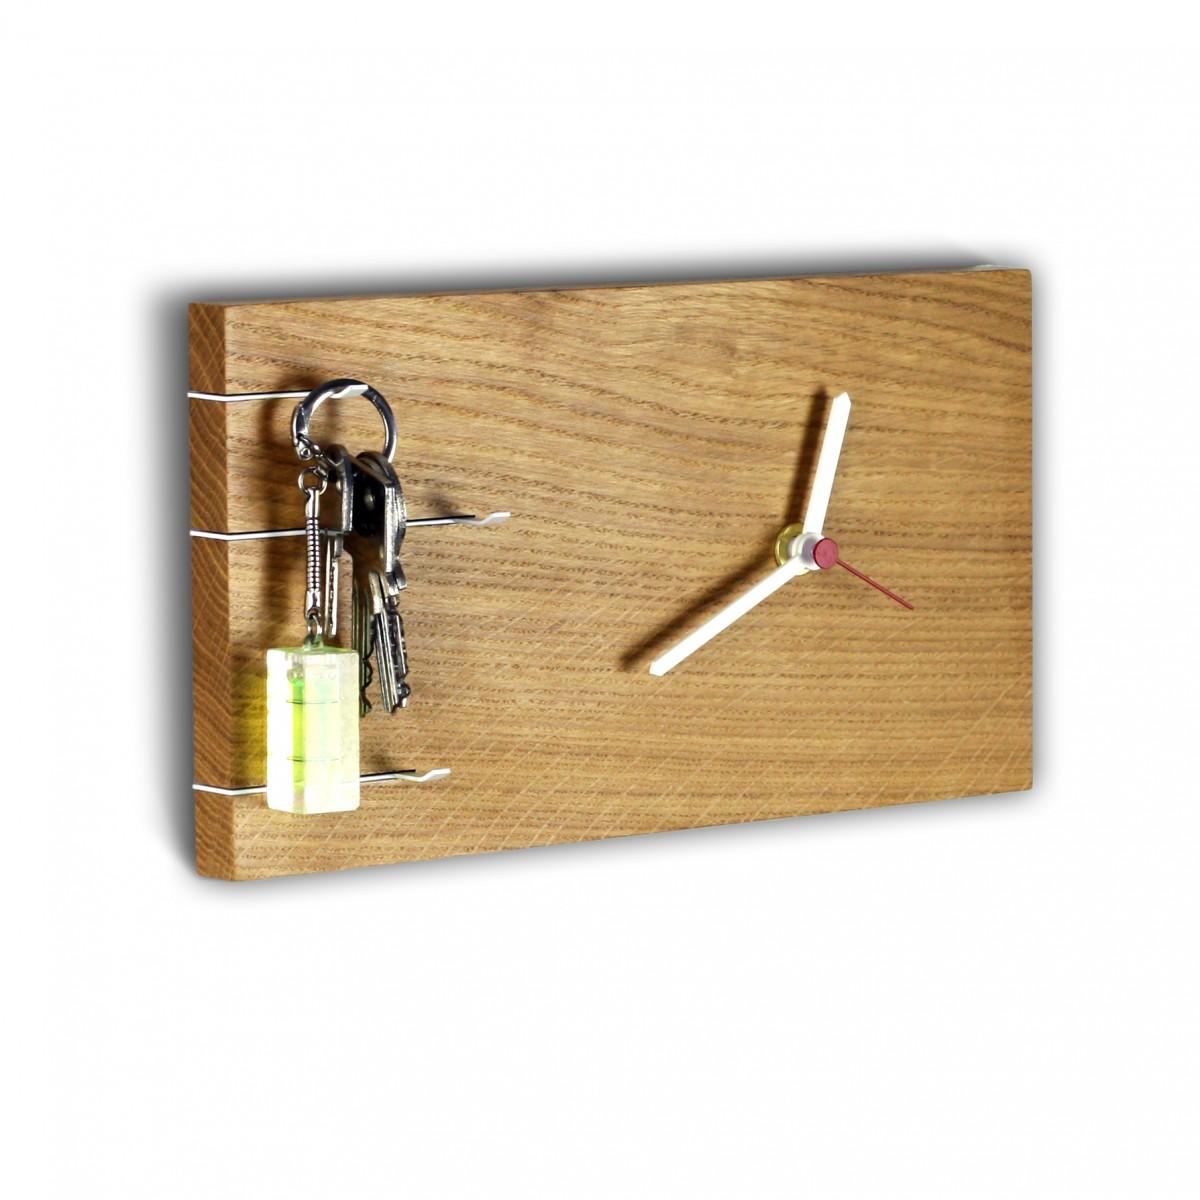 toshi NOVA Schlüsselbrett mit Uhr